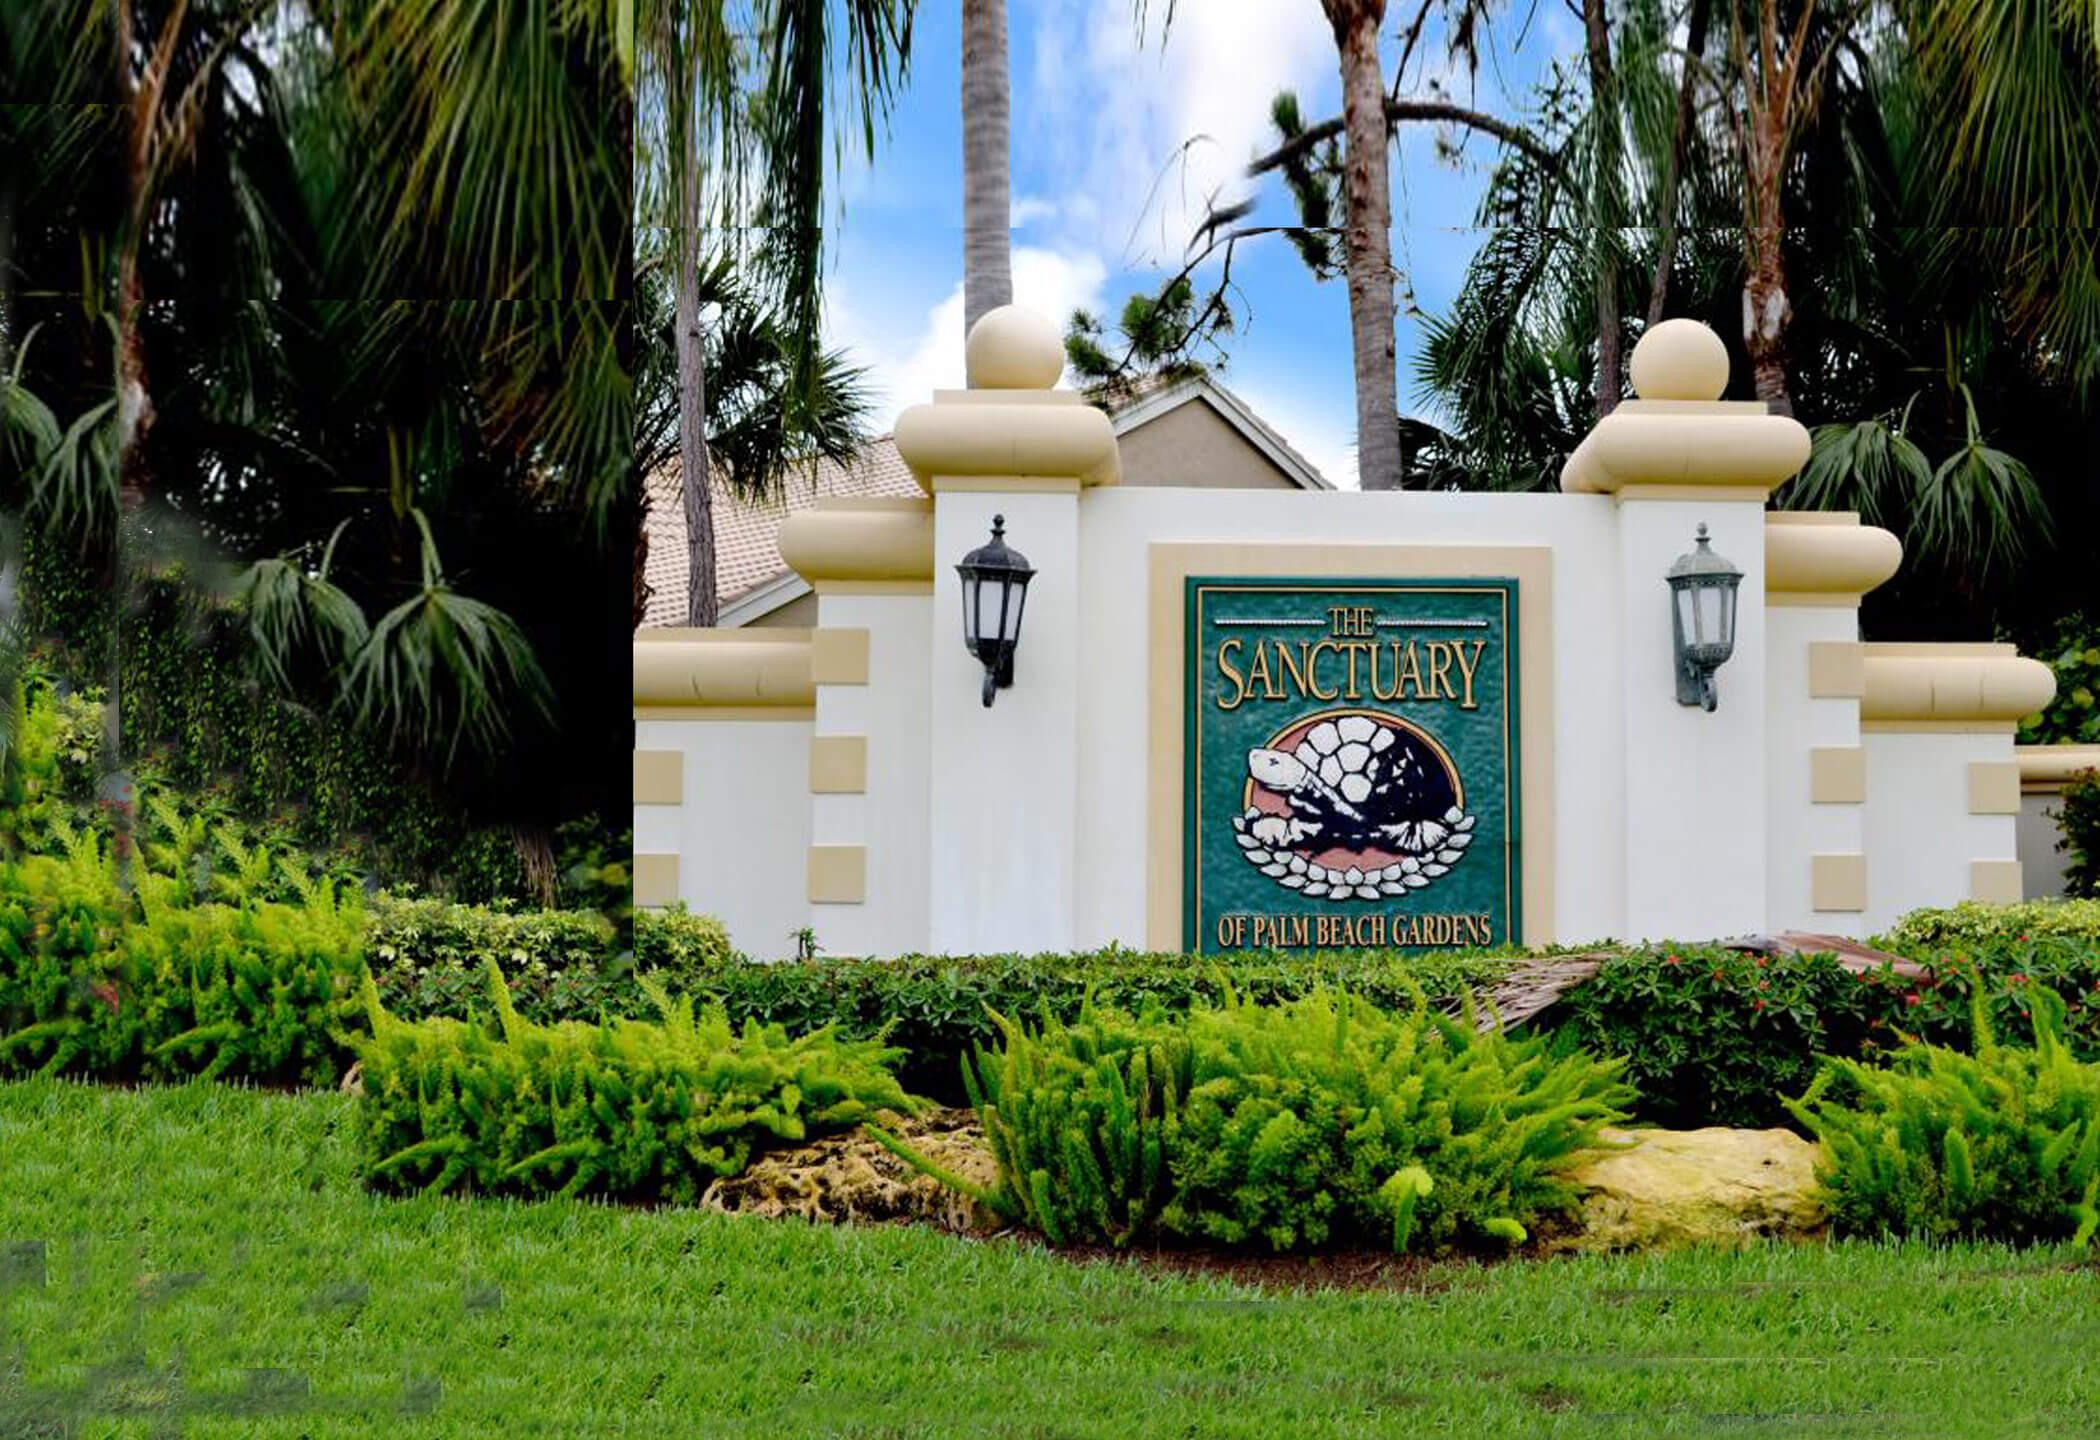 Sanctuary Palm Beach Gardens Homes for sale